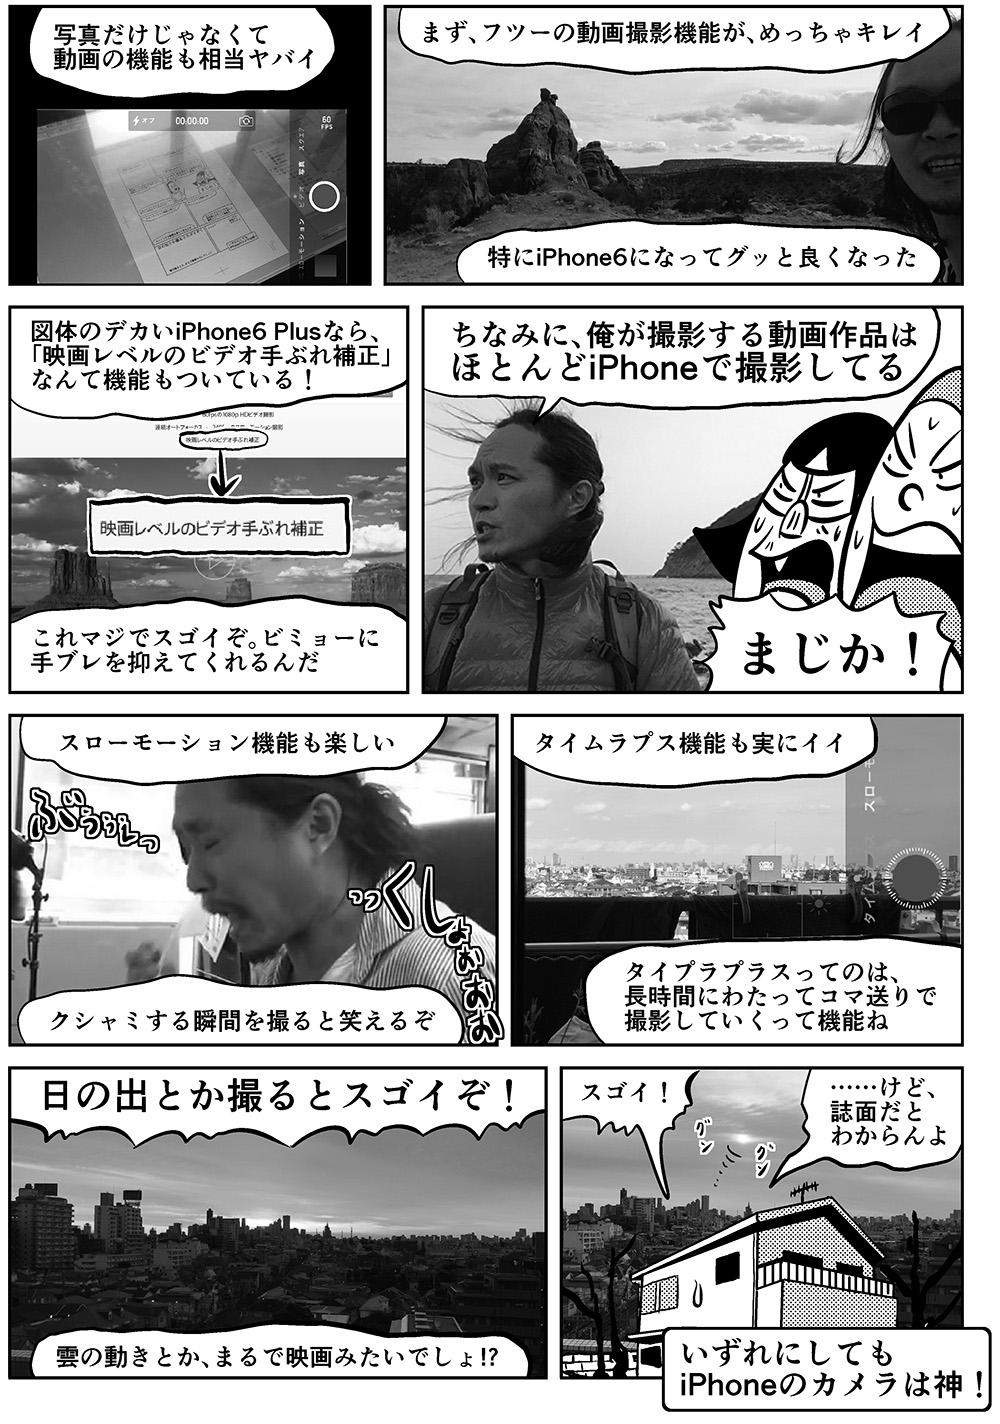 otani-iphone4